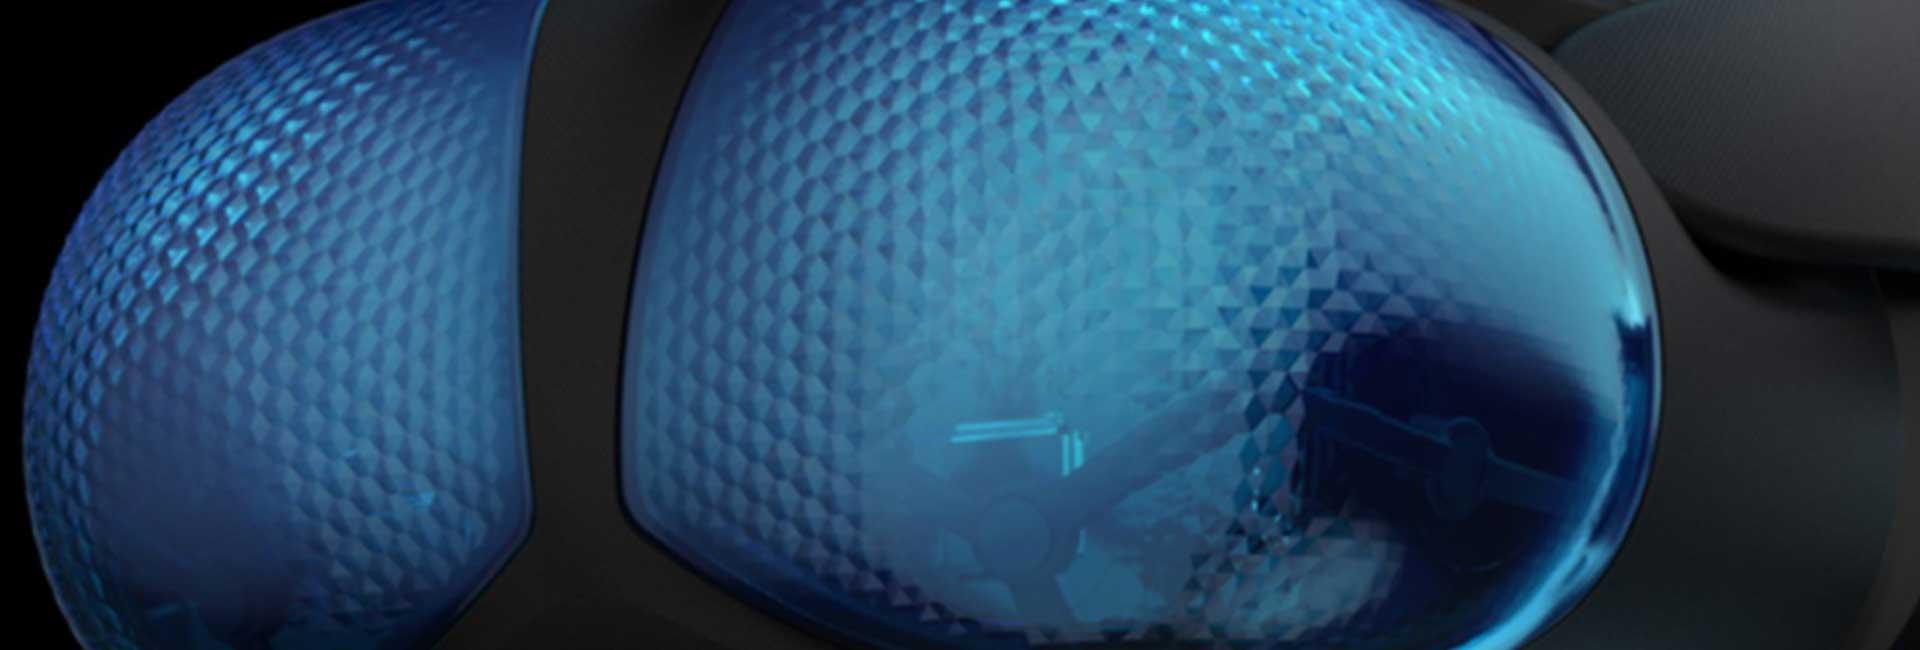 samsung-odyssey-HMD